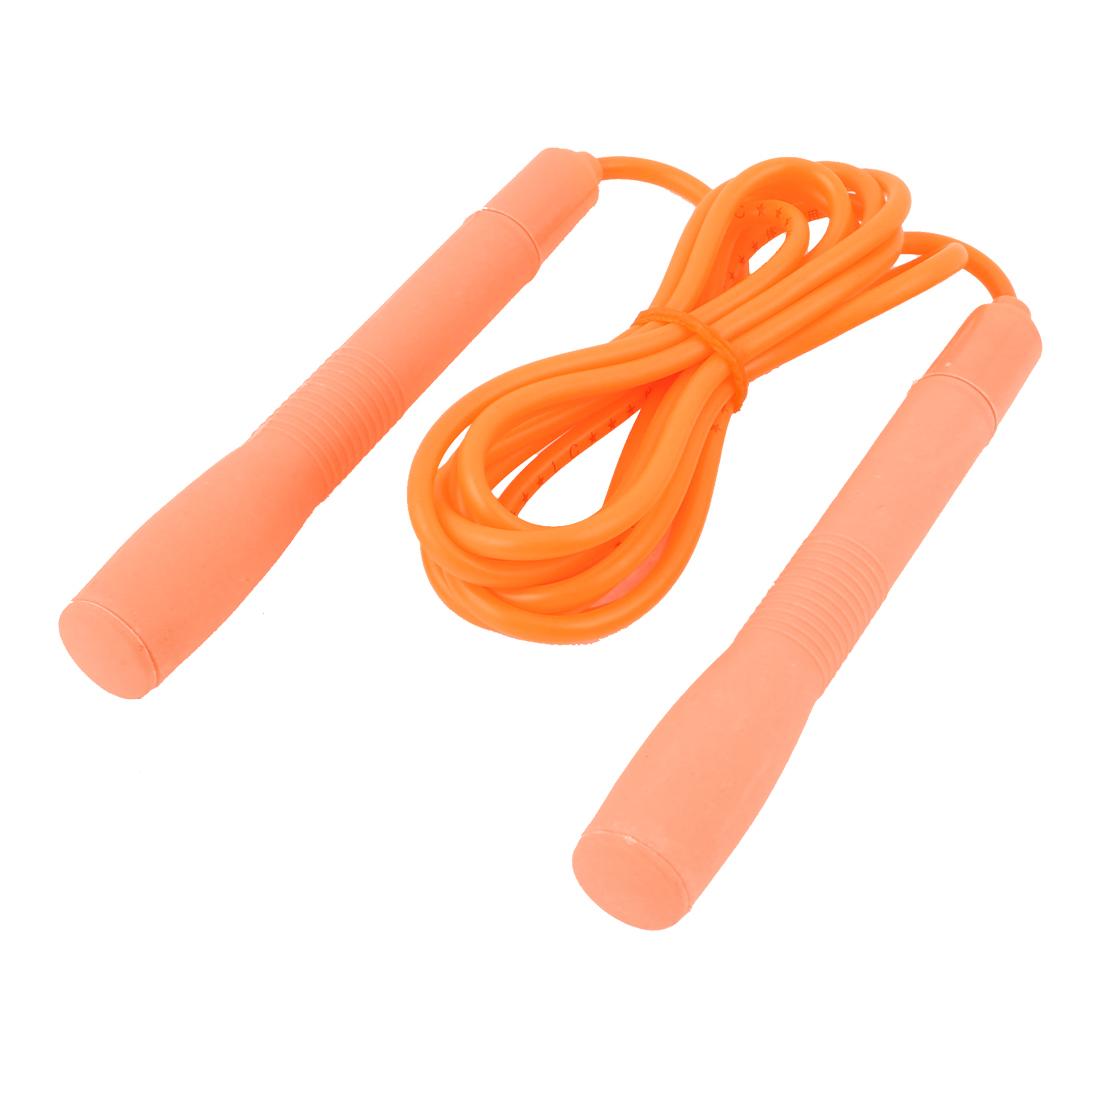 Plastic Handle Sports Game Jumping Skipping Rope Skip Orange